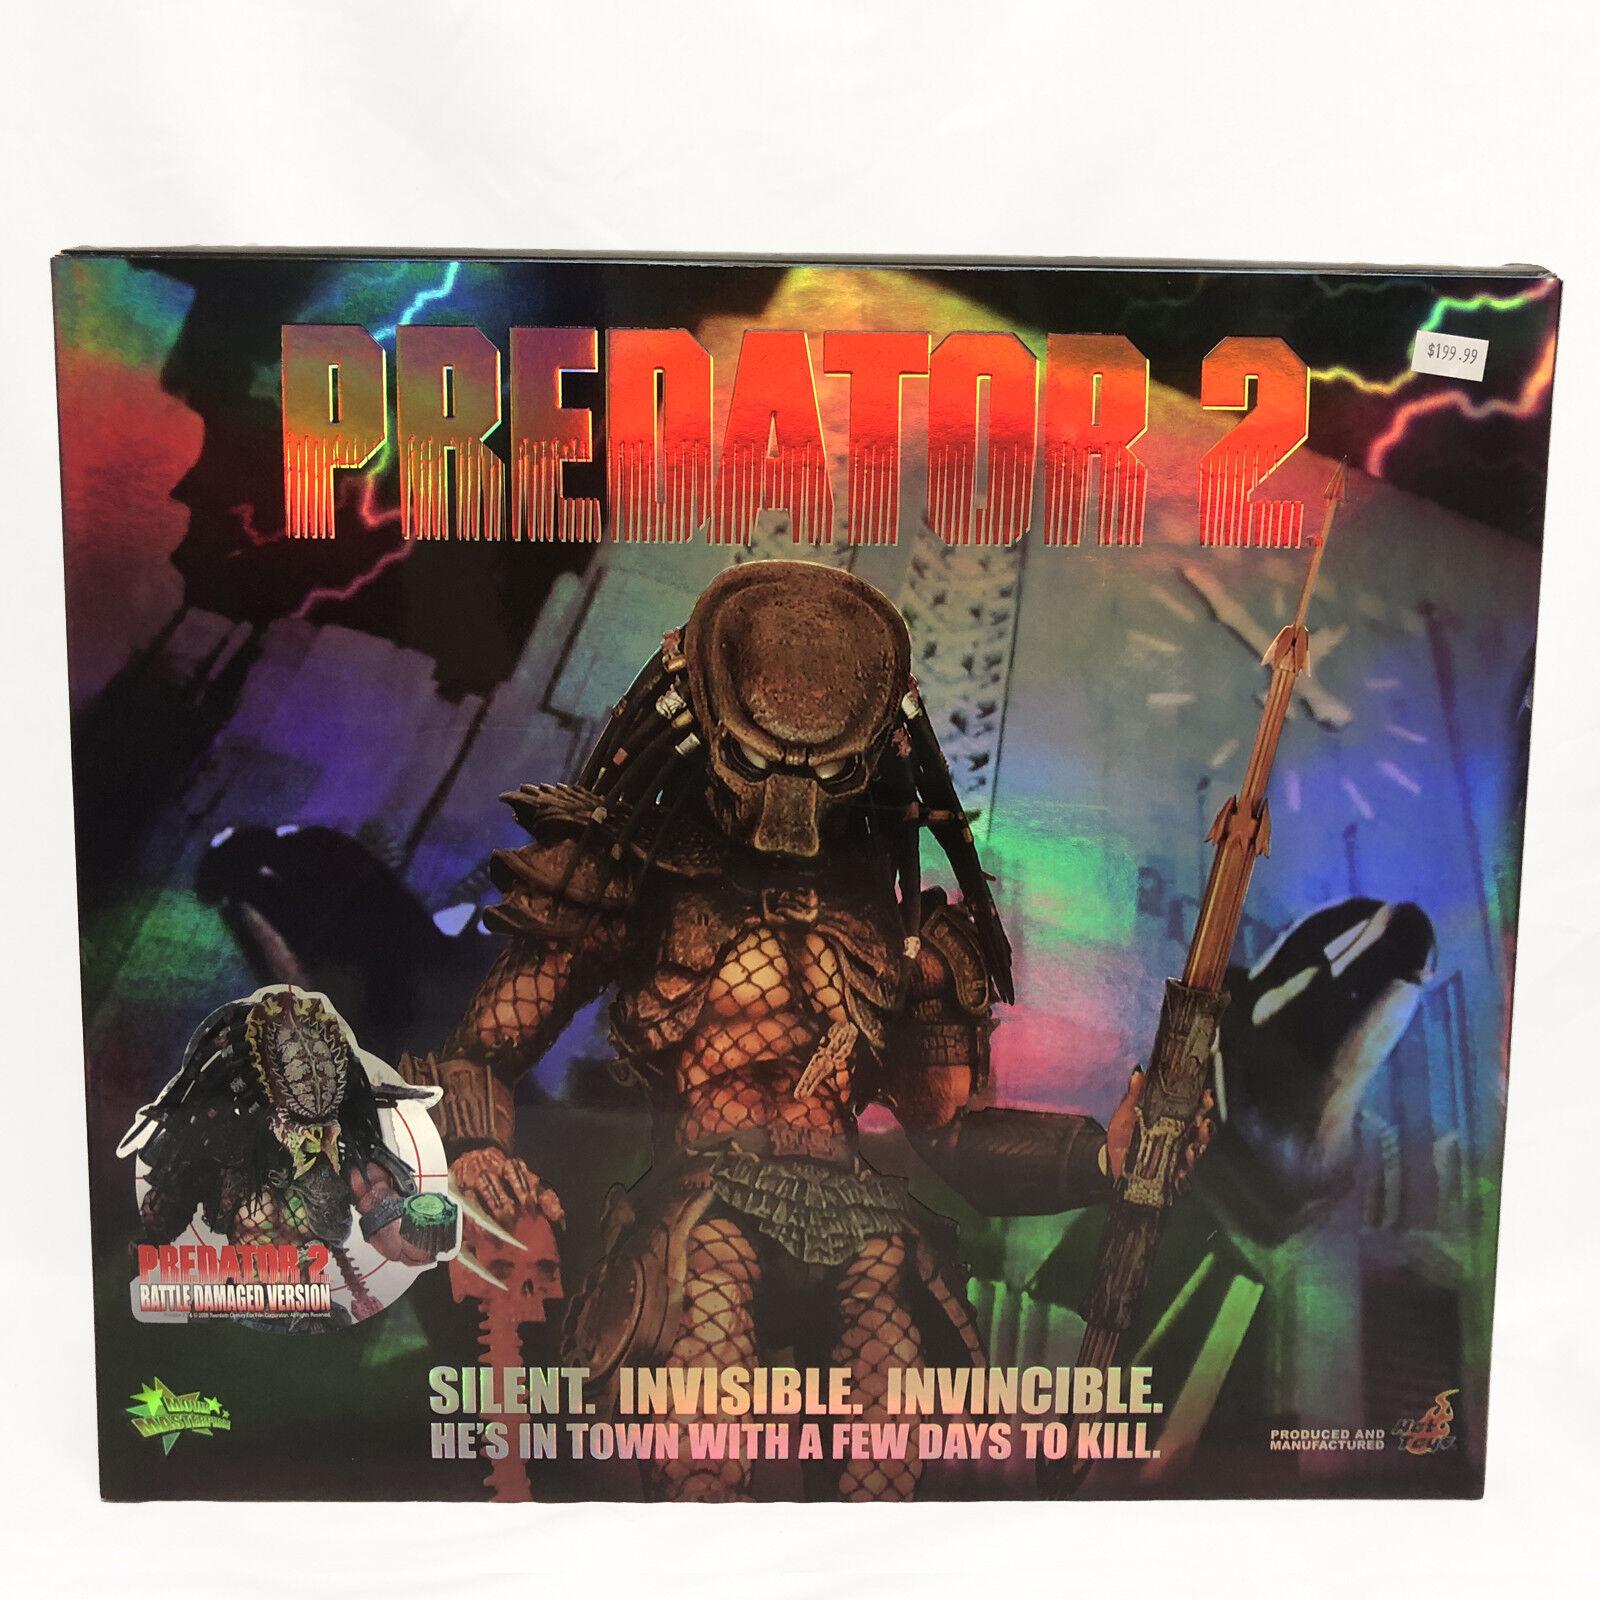 Hot Toys Depredador 2 Battle Damaged versión MMS45 1:6 escala 2018 Nuevo